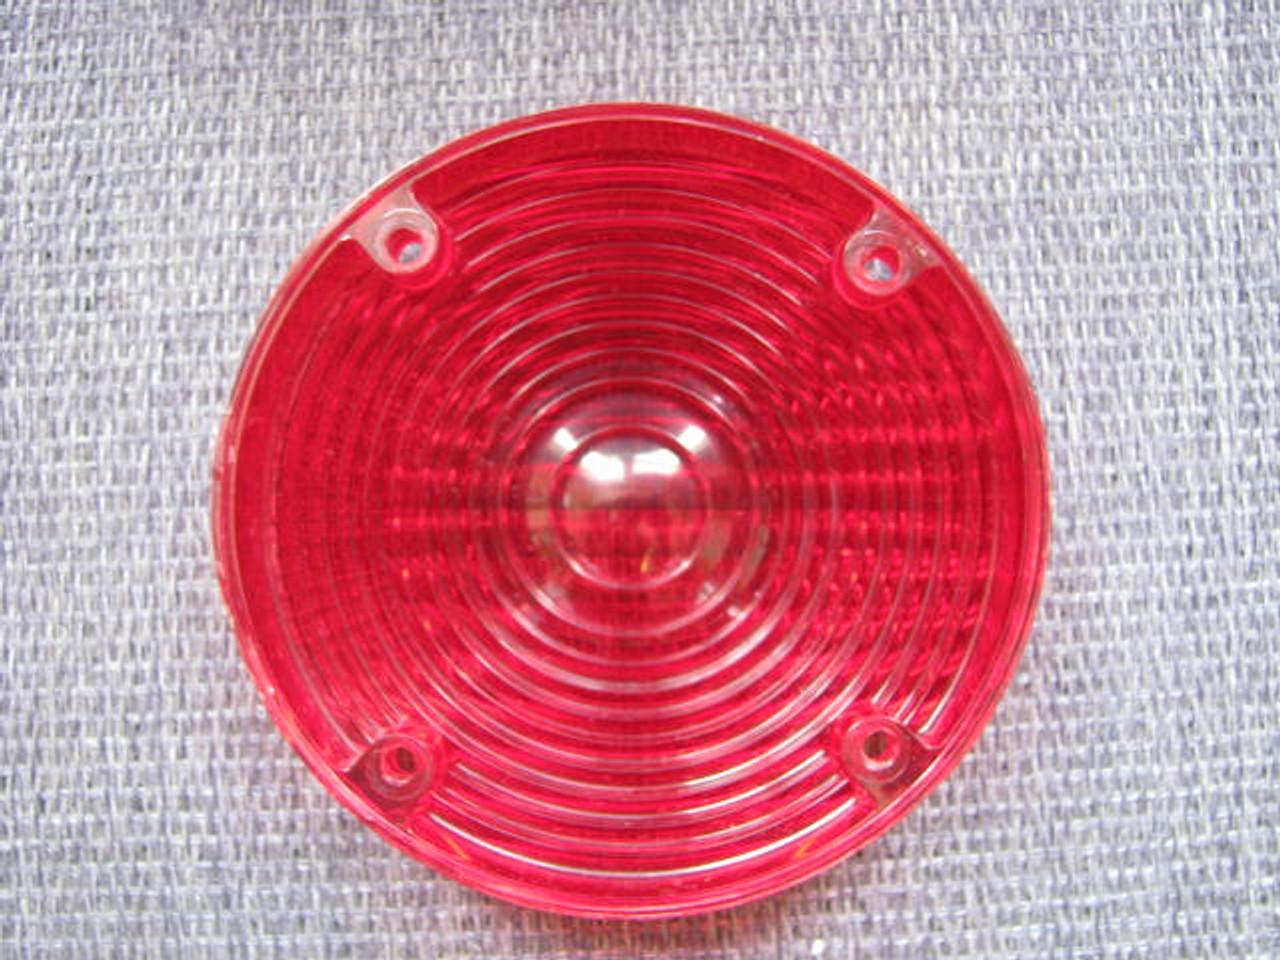 Bargman #6 Reproduction Tail Light Lens (CLT082) REAR VIEW